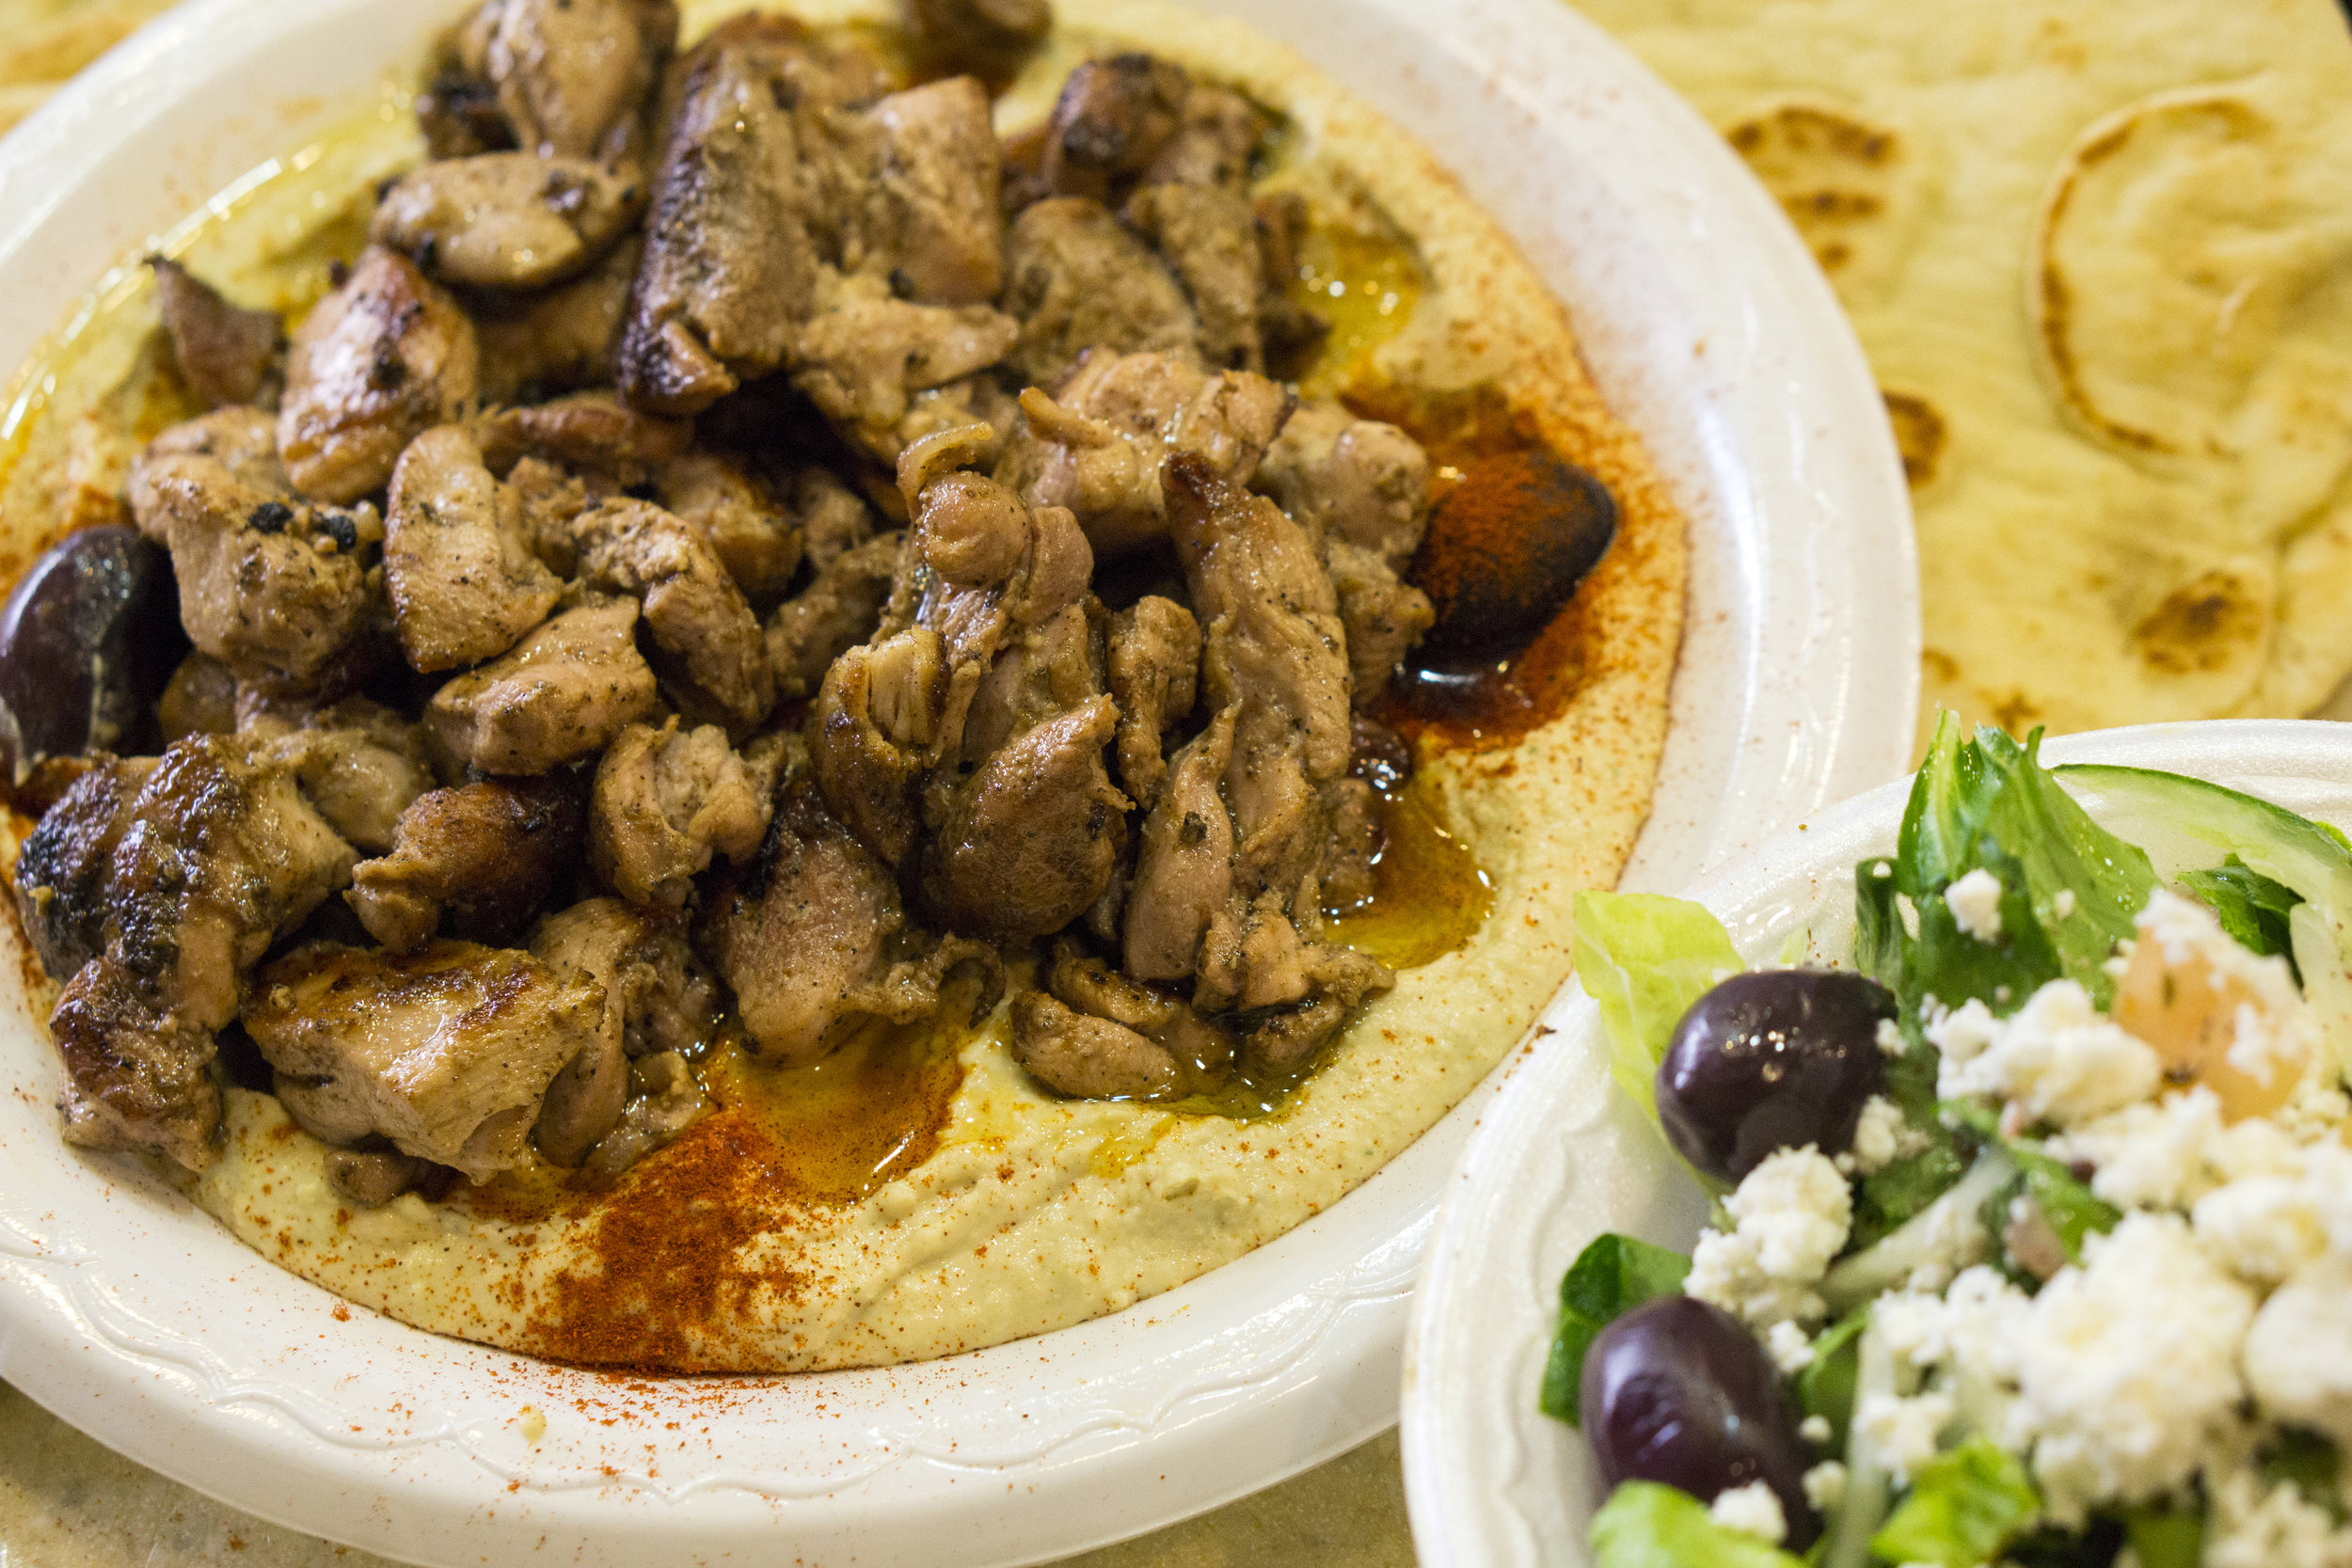 Hummus Plate with Shawarma